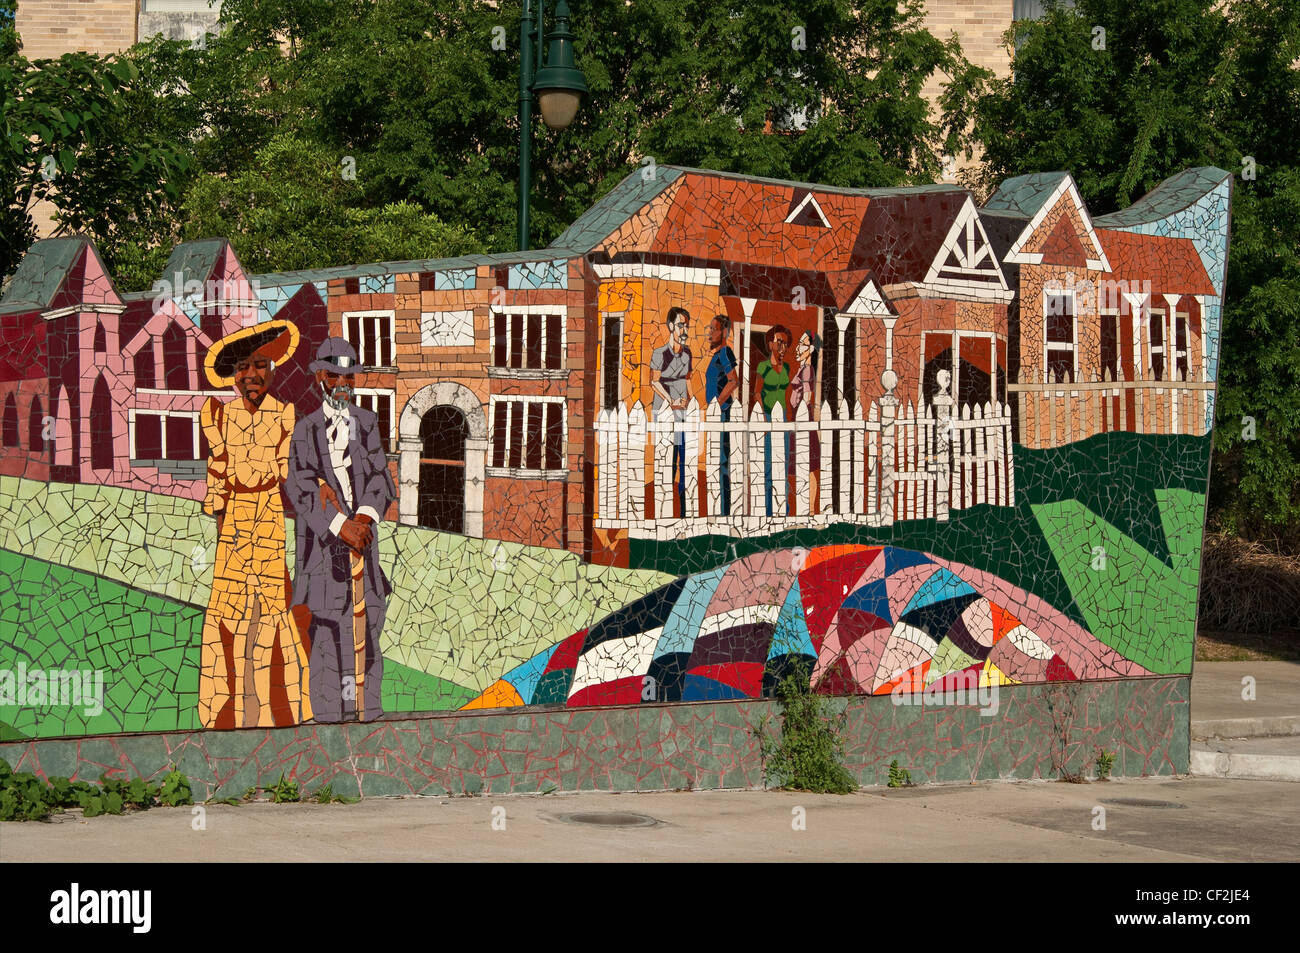 """Rhapsody"" Fliesen Mosaik Wandbild von John yancey, bei dr. charles e. urdy Plaza in Austin, Texas, USA Stockbild"